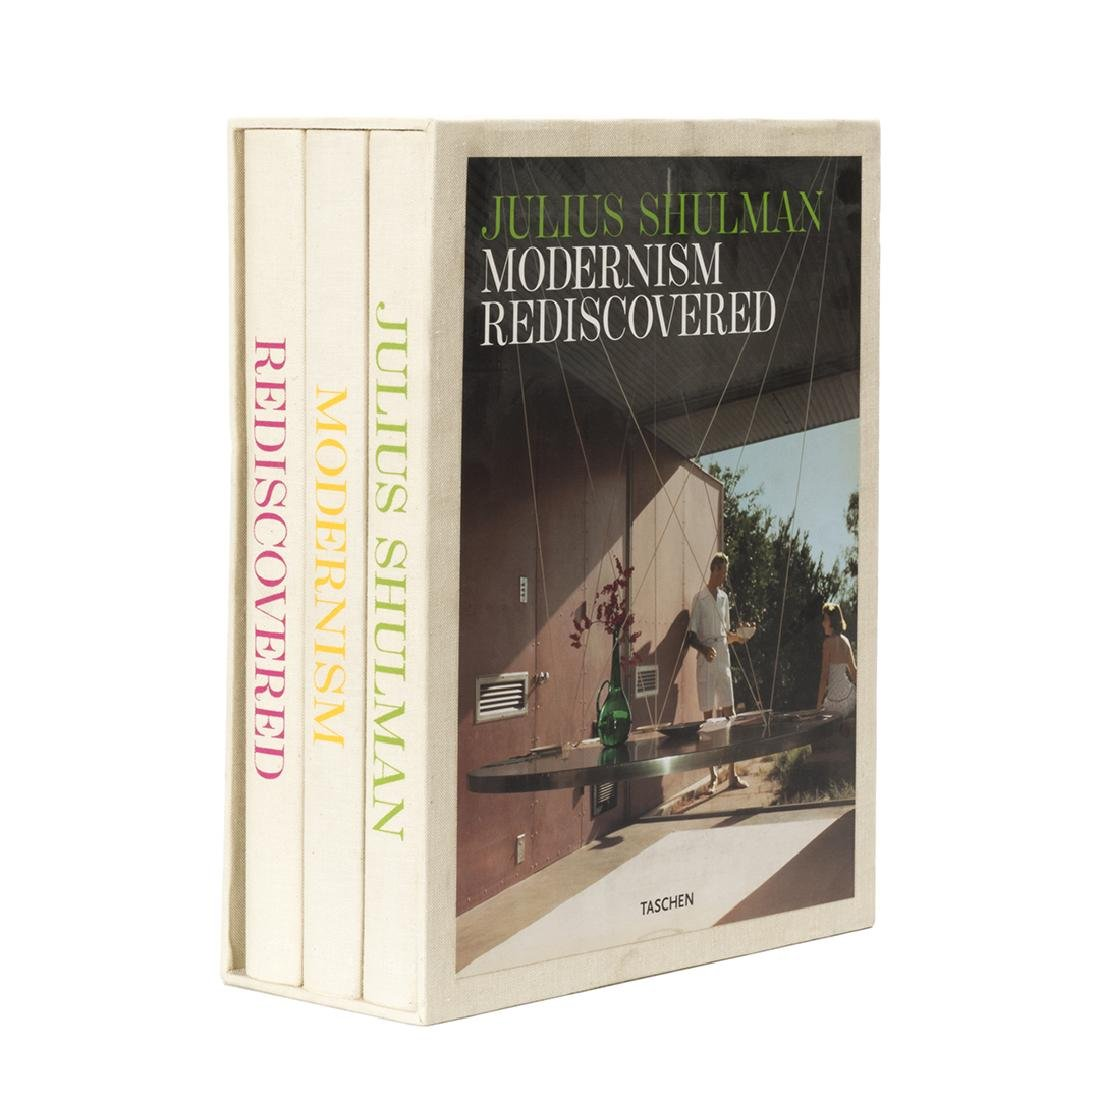 Julius Shulman Modernism Rediscovered Boxed Set